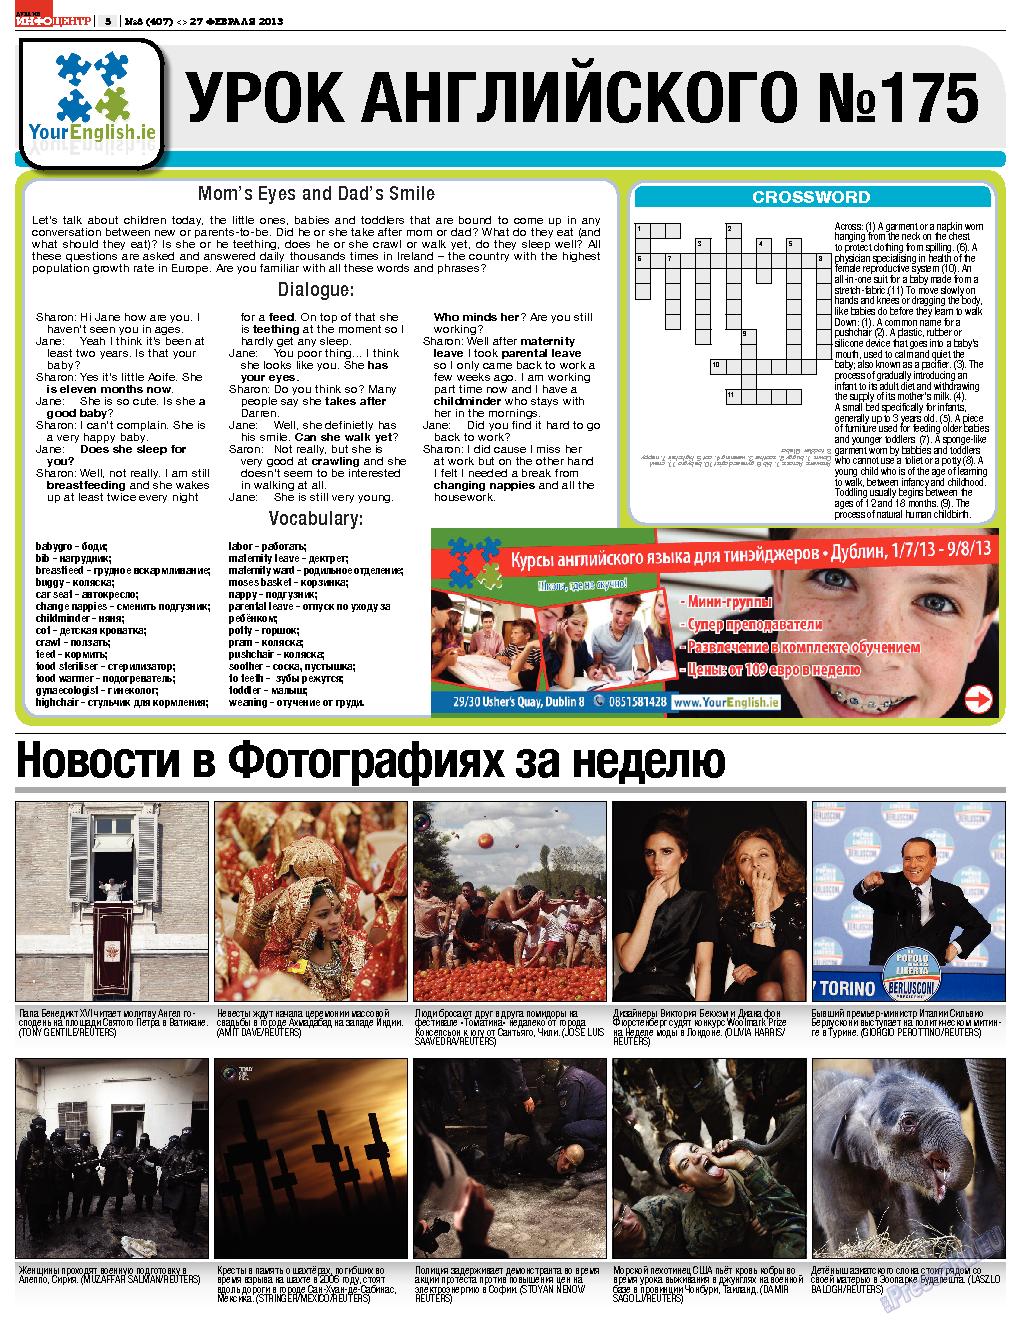 Дублин инфоцентр (газета). 2013 год, номер 8, стр. 5